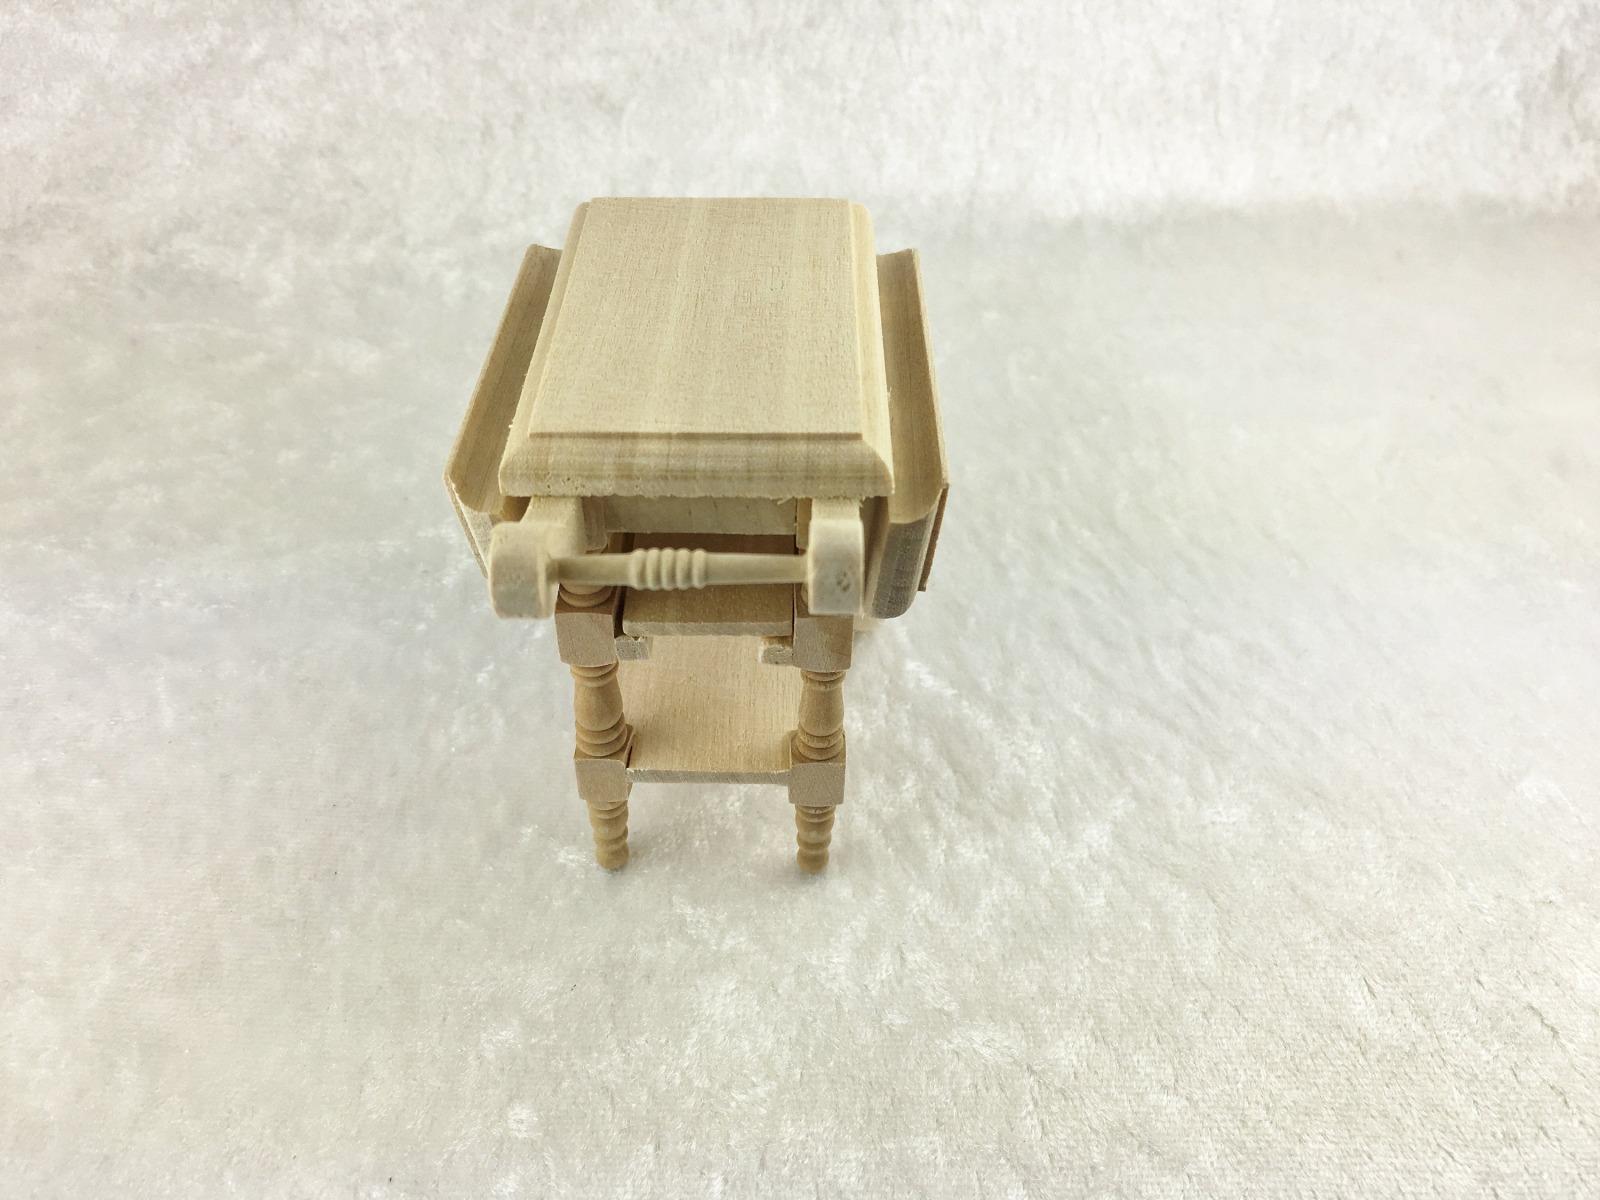 Teewagen 1:12 Miniatur 5